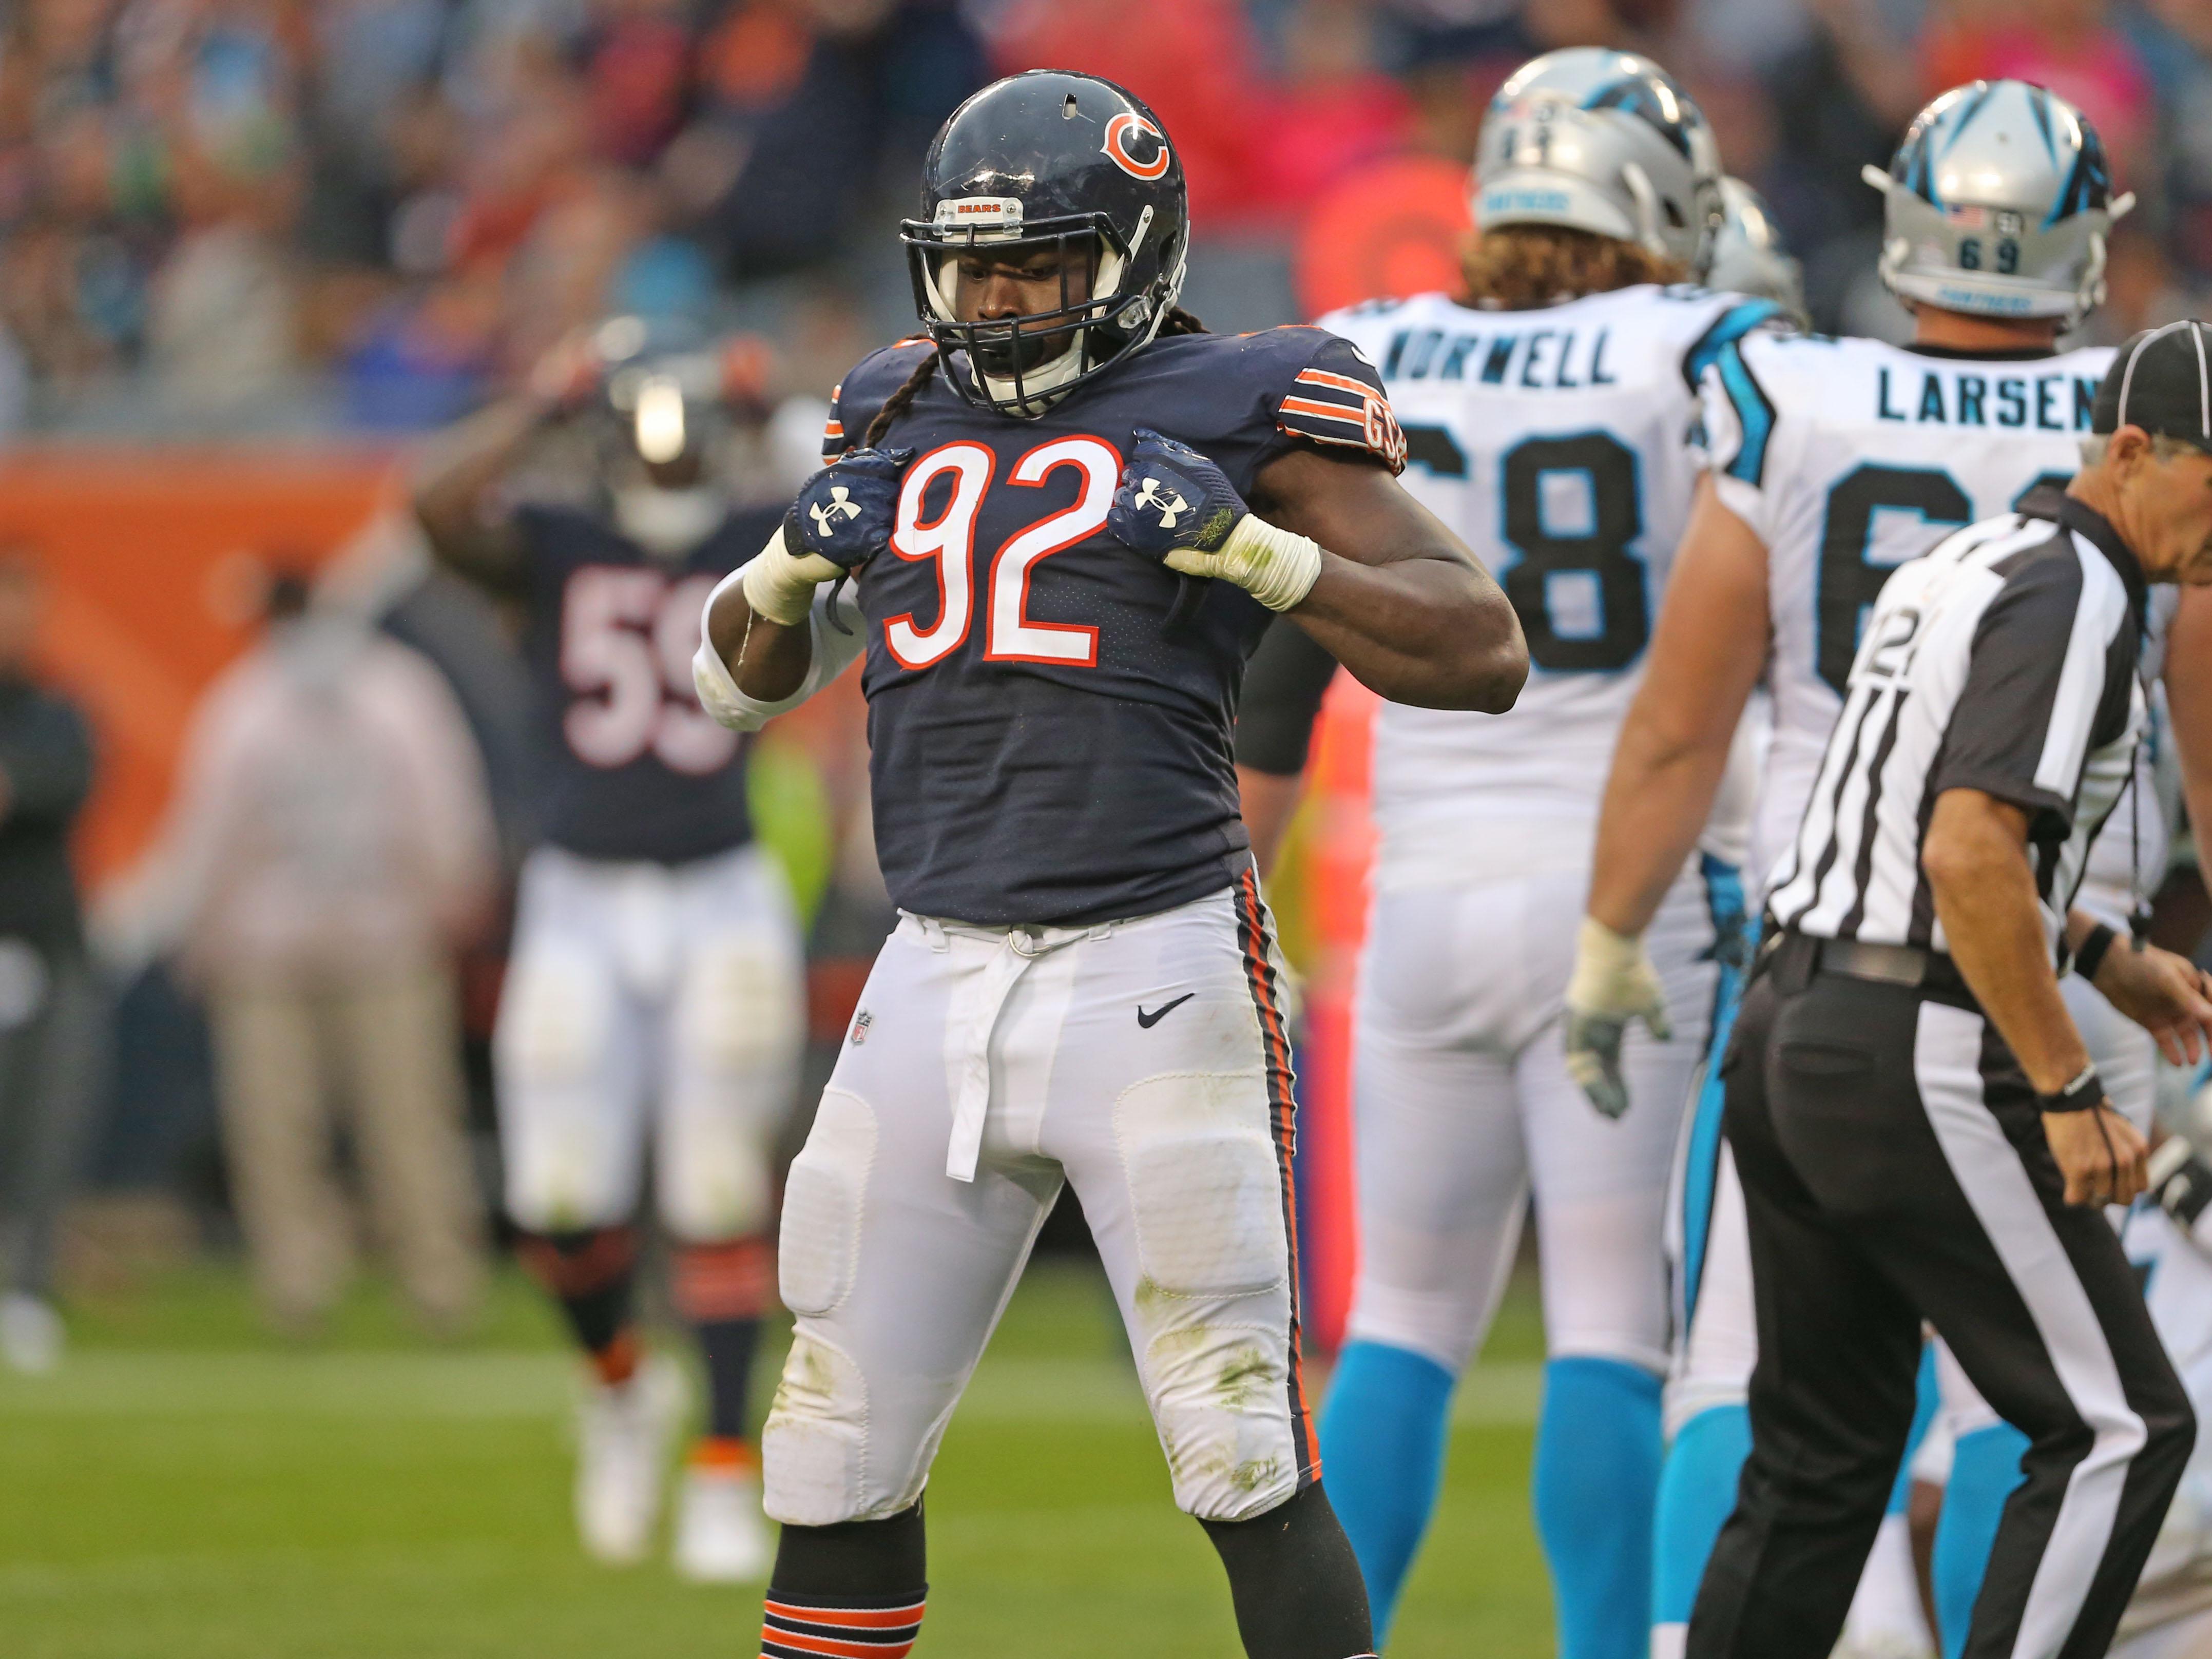 NFL: Carolina Panthers at Chicago Bears